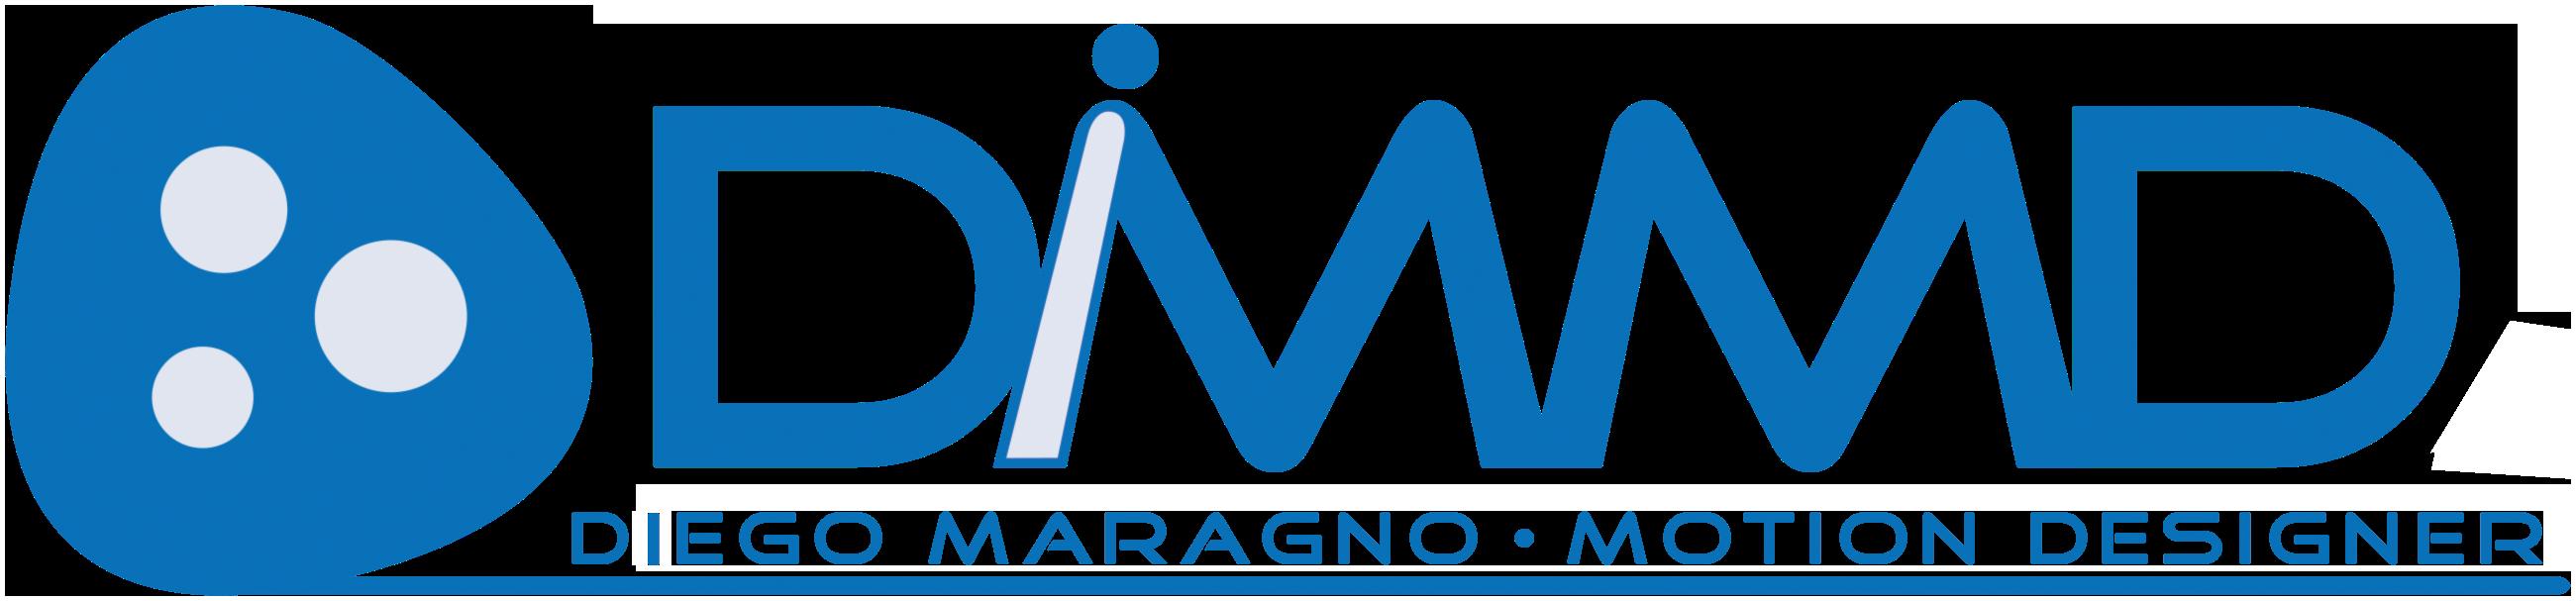 Diego Maragno Motion Designer